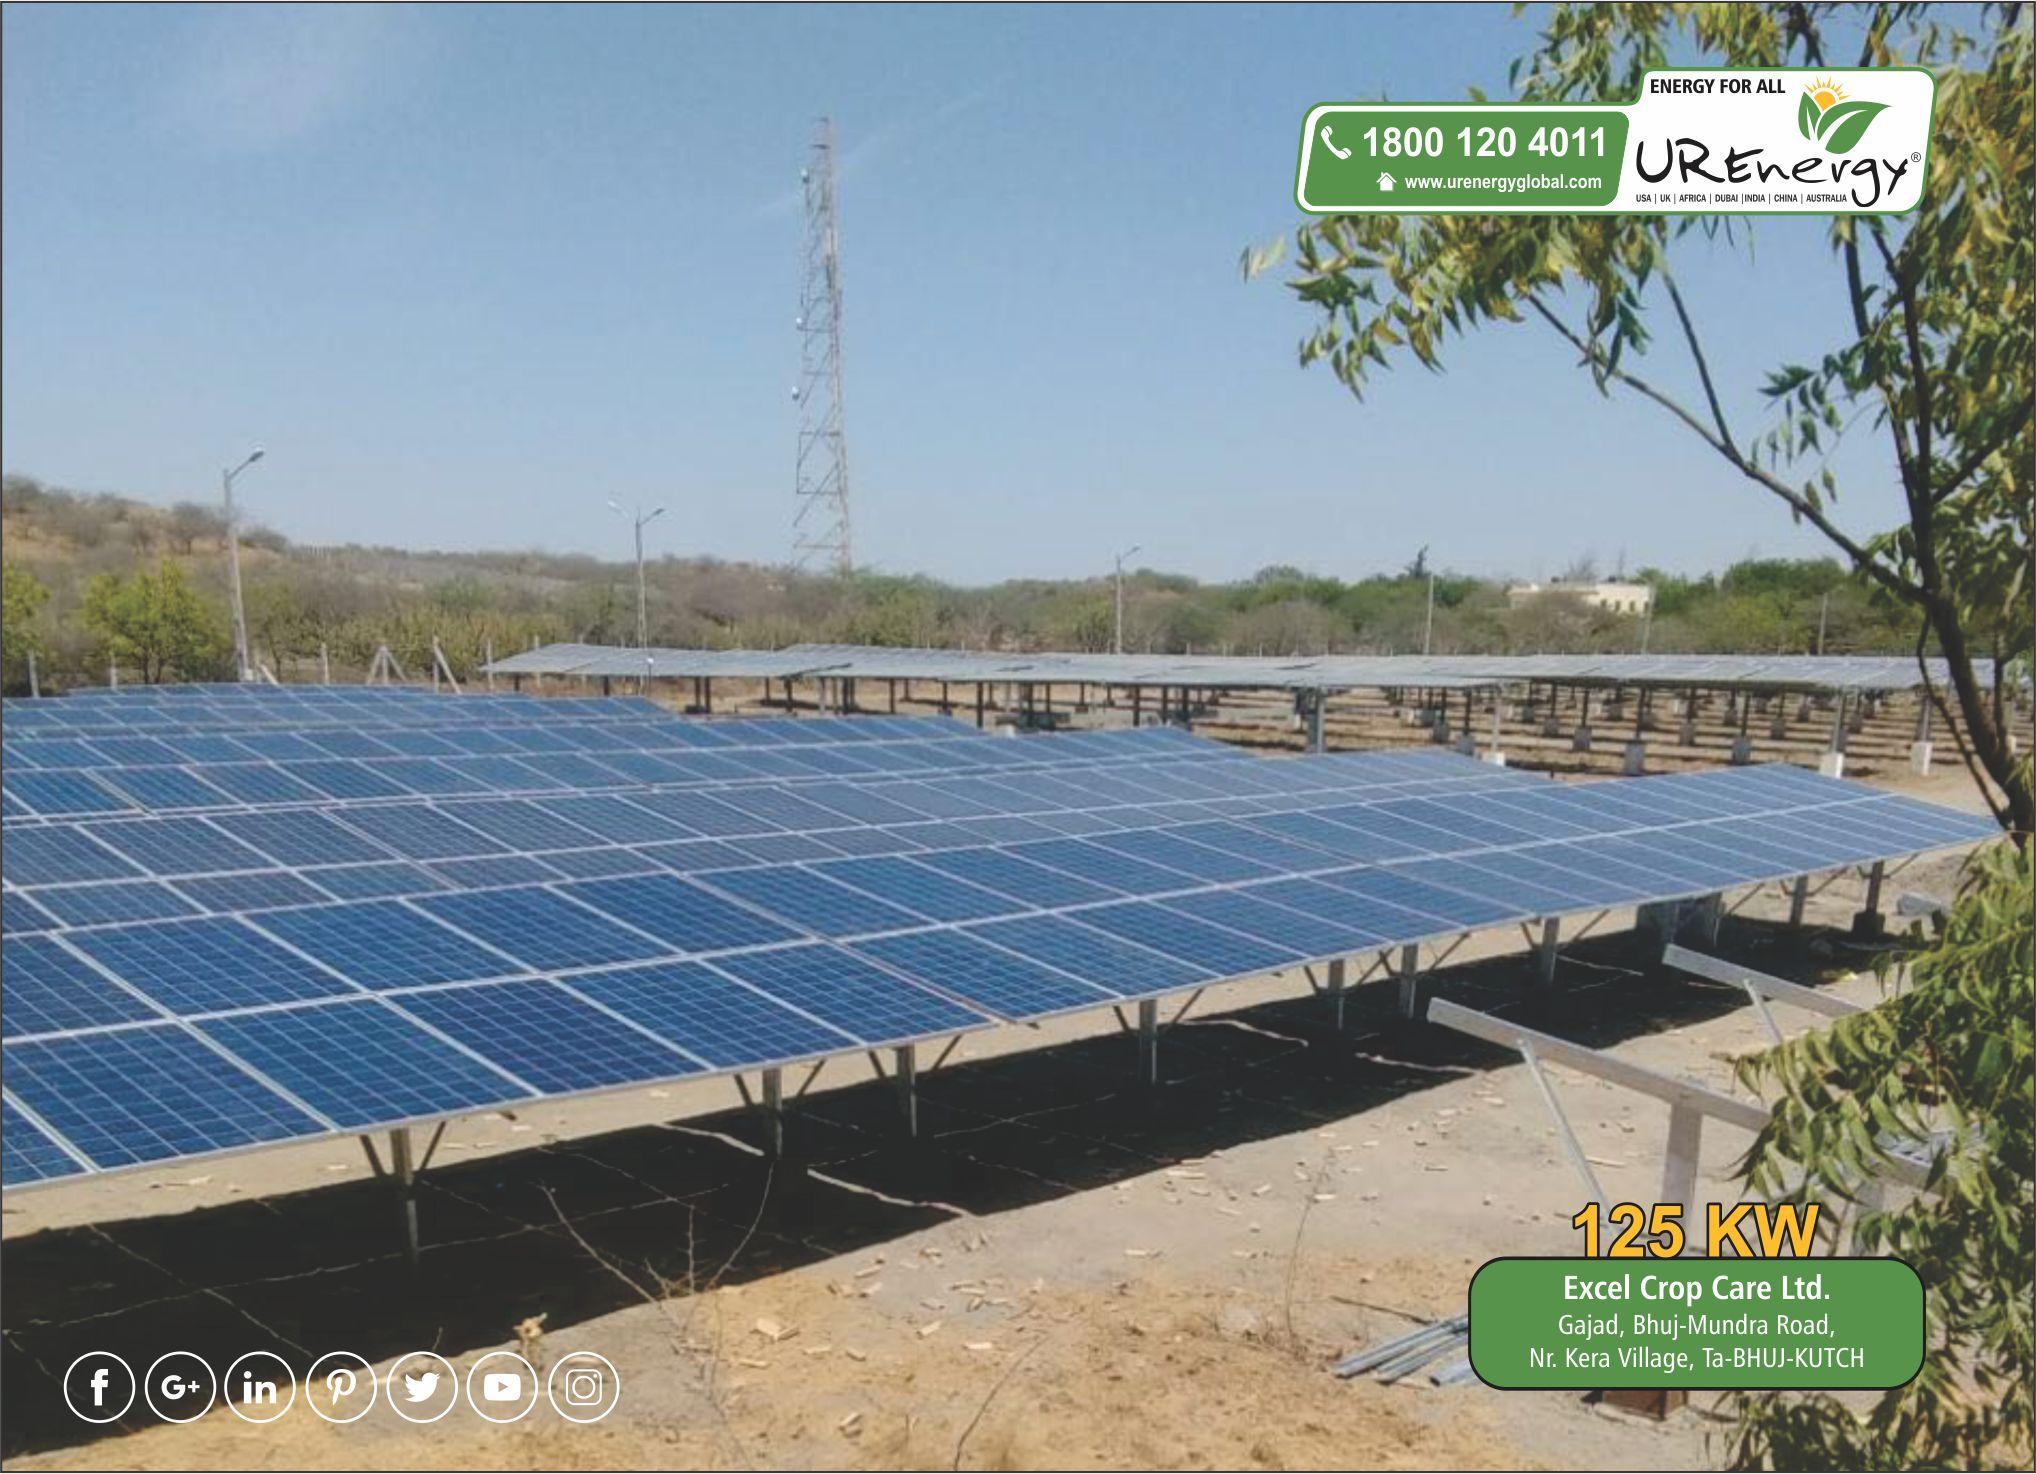 Solar Power Panel Inverters Irrigation Pumps Street Light Epc Solar Solar Water Pump Solar Panels